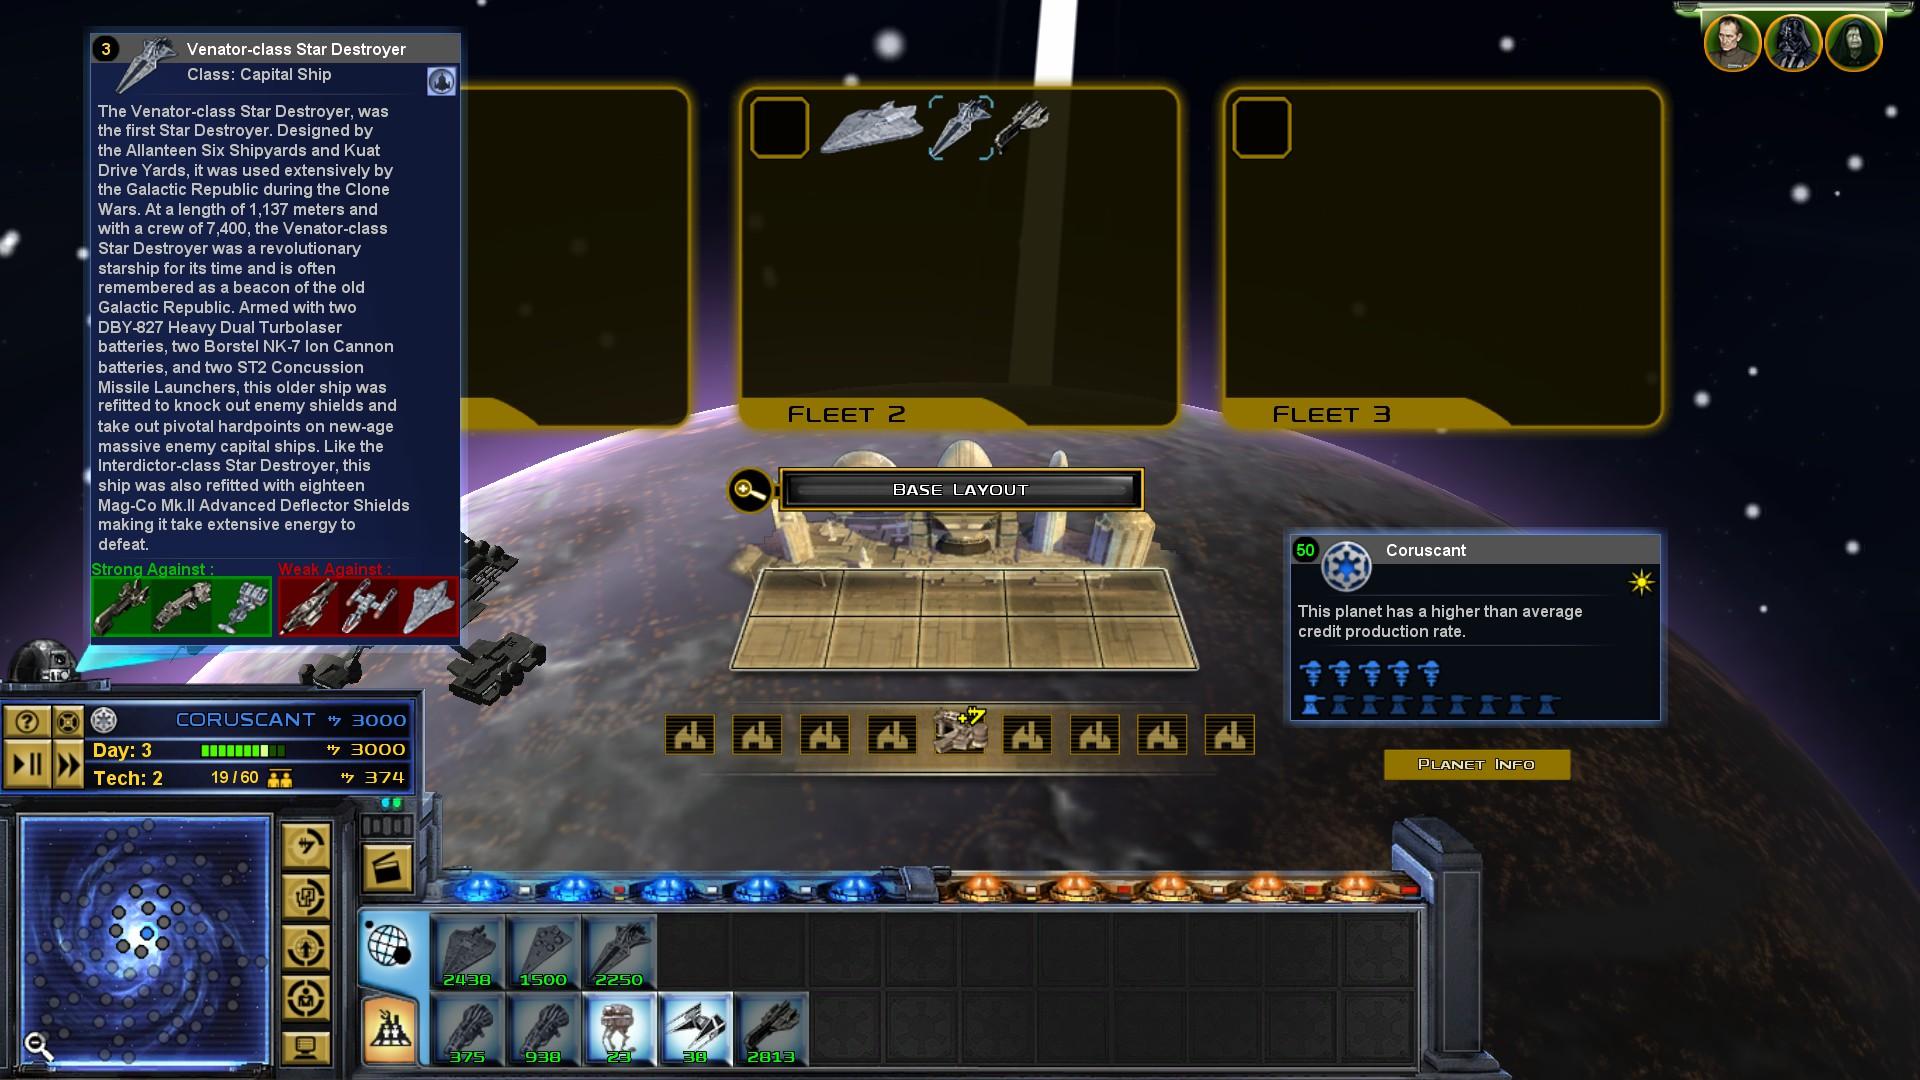 Venator Class Star Destroyer Image Mod Db